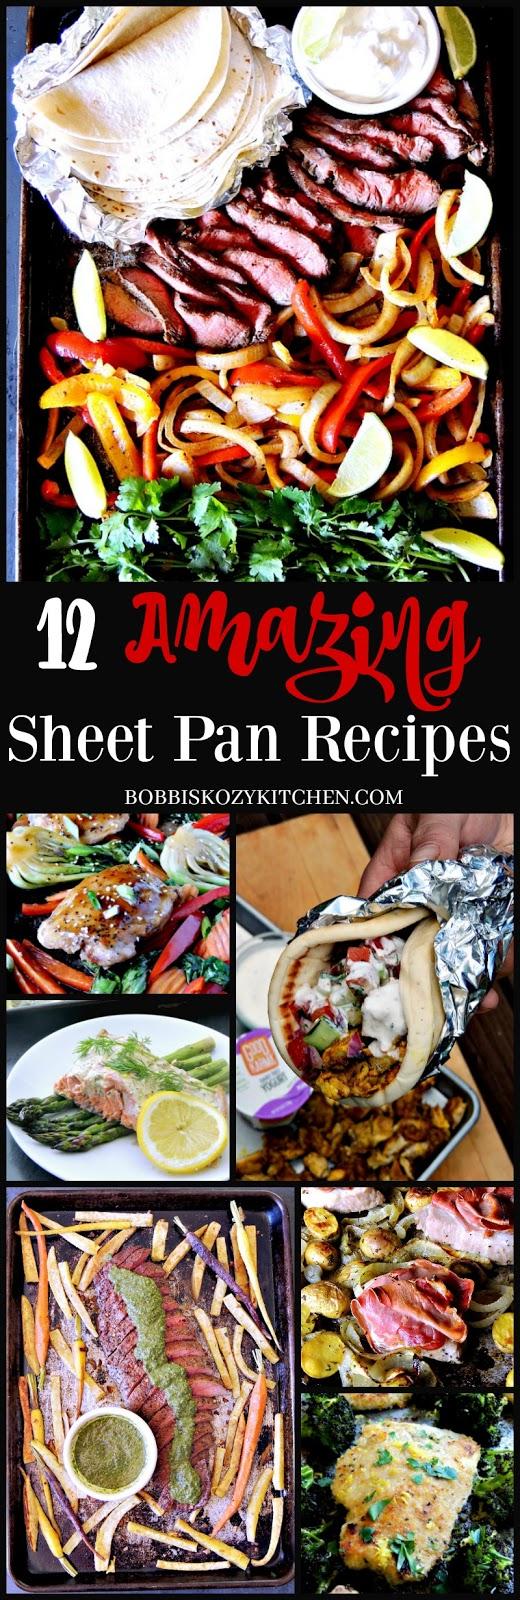 12 Amazing Sheet Pan Recipes from www.bobbiskozykitchen.com